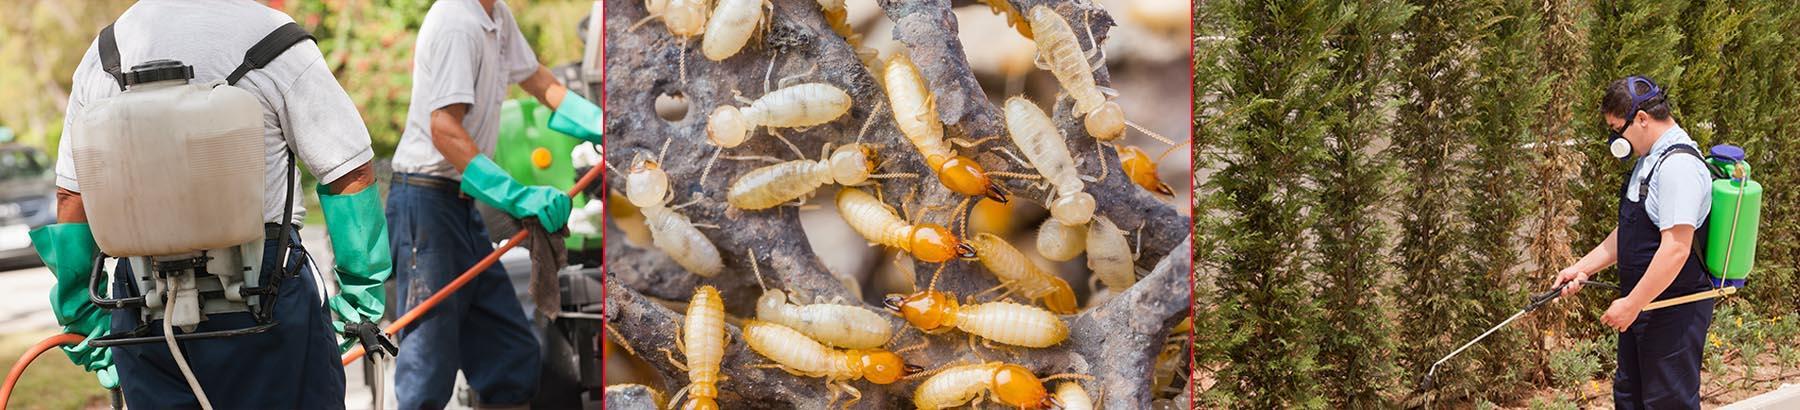 South Bay Termite Control image 2